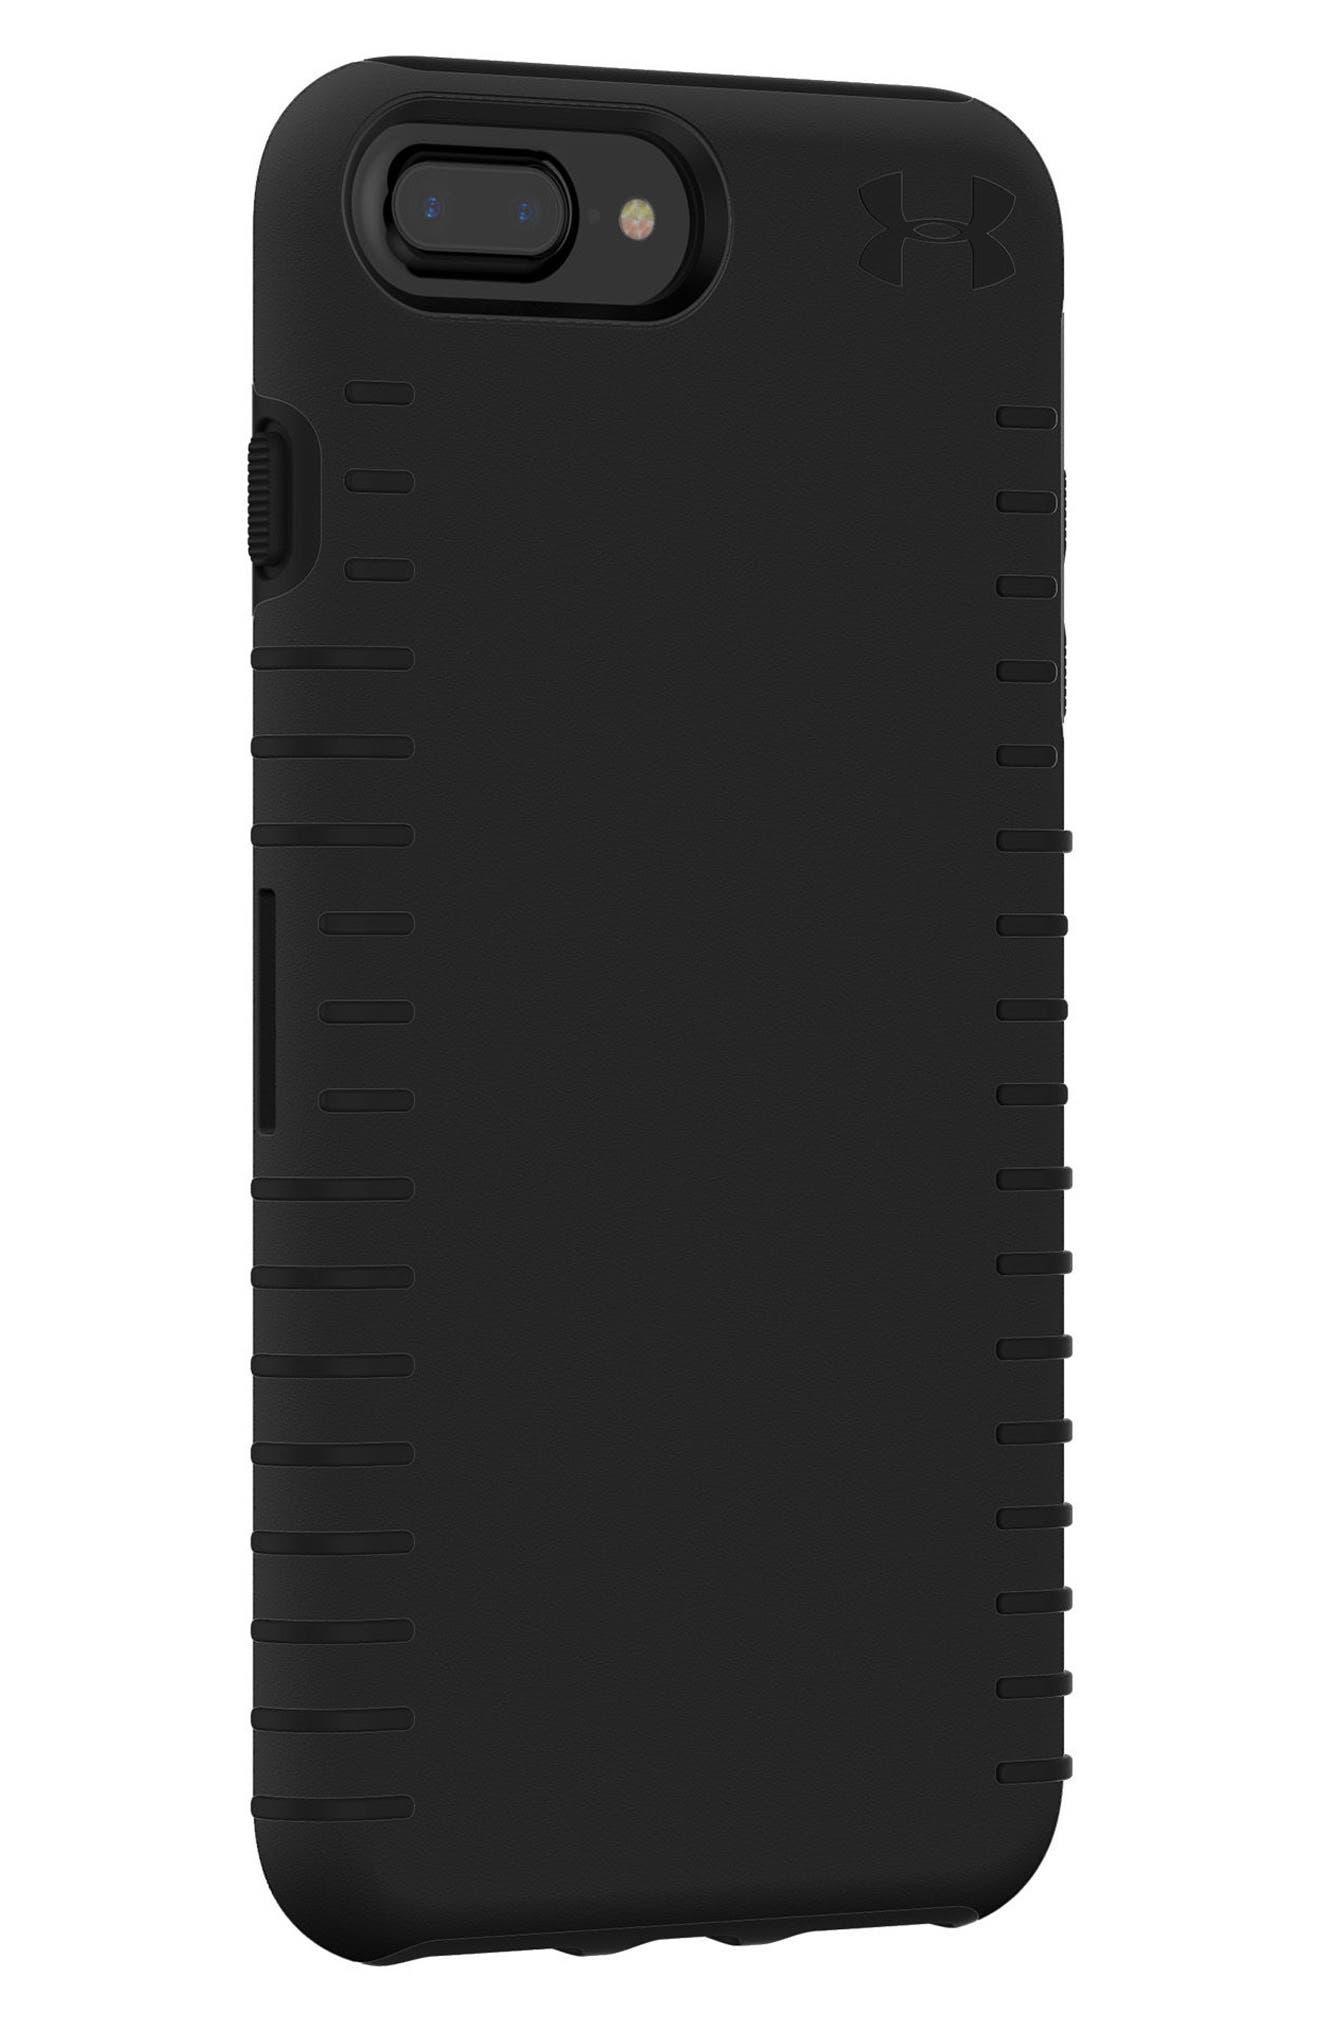 Protect Grip iPhone 6/6s/7/8 Plus Case,                             Alternate thumbnail 2, color,                             001